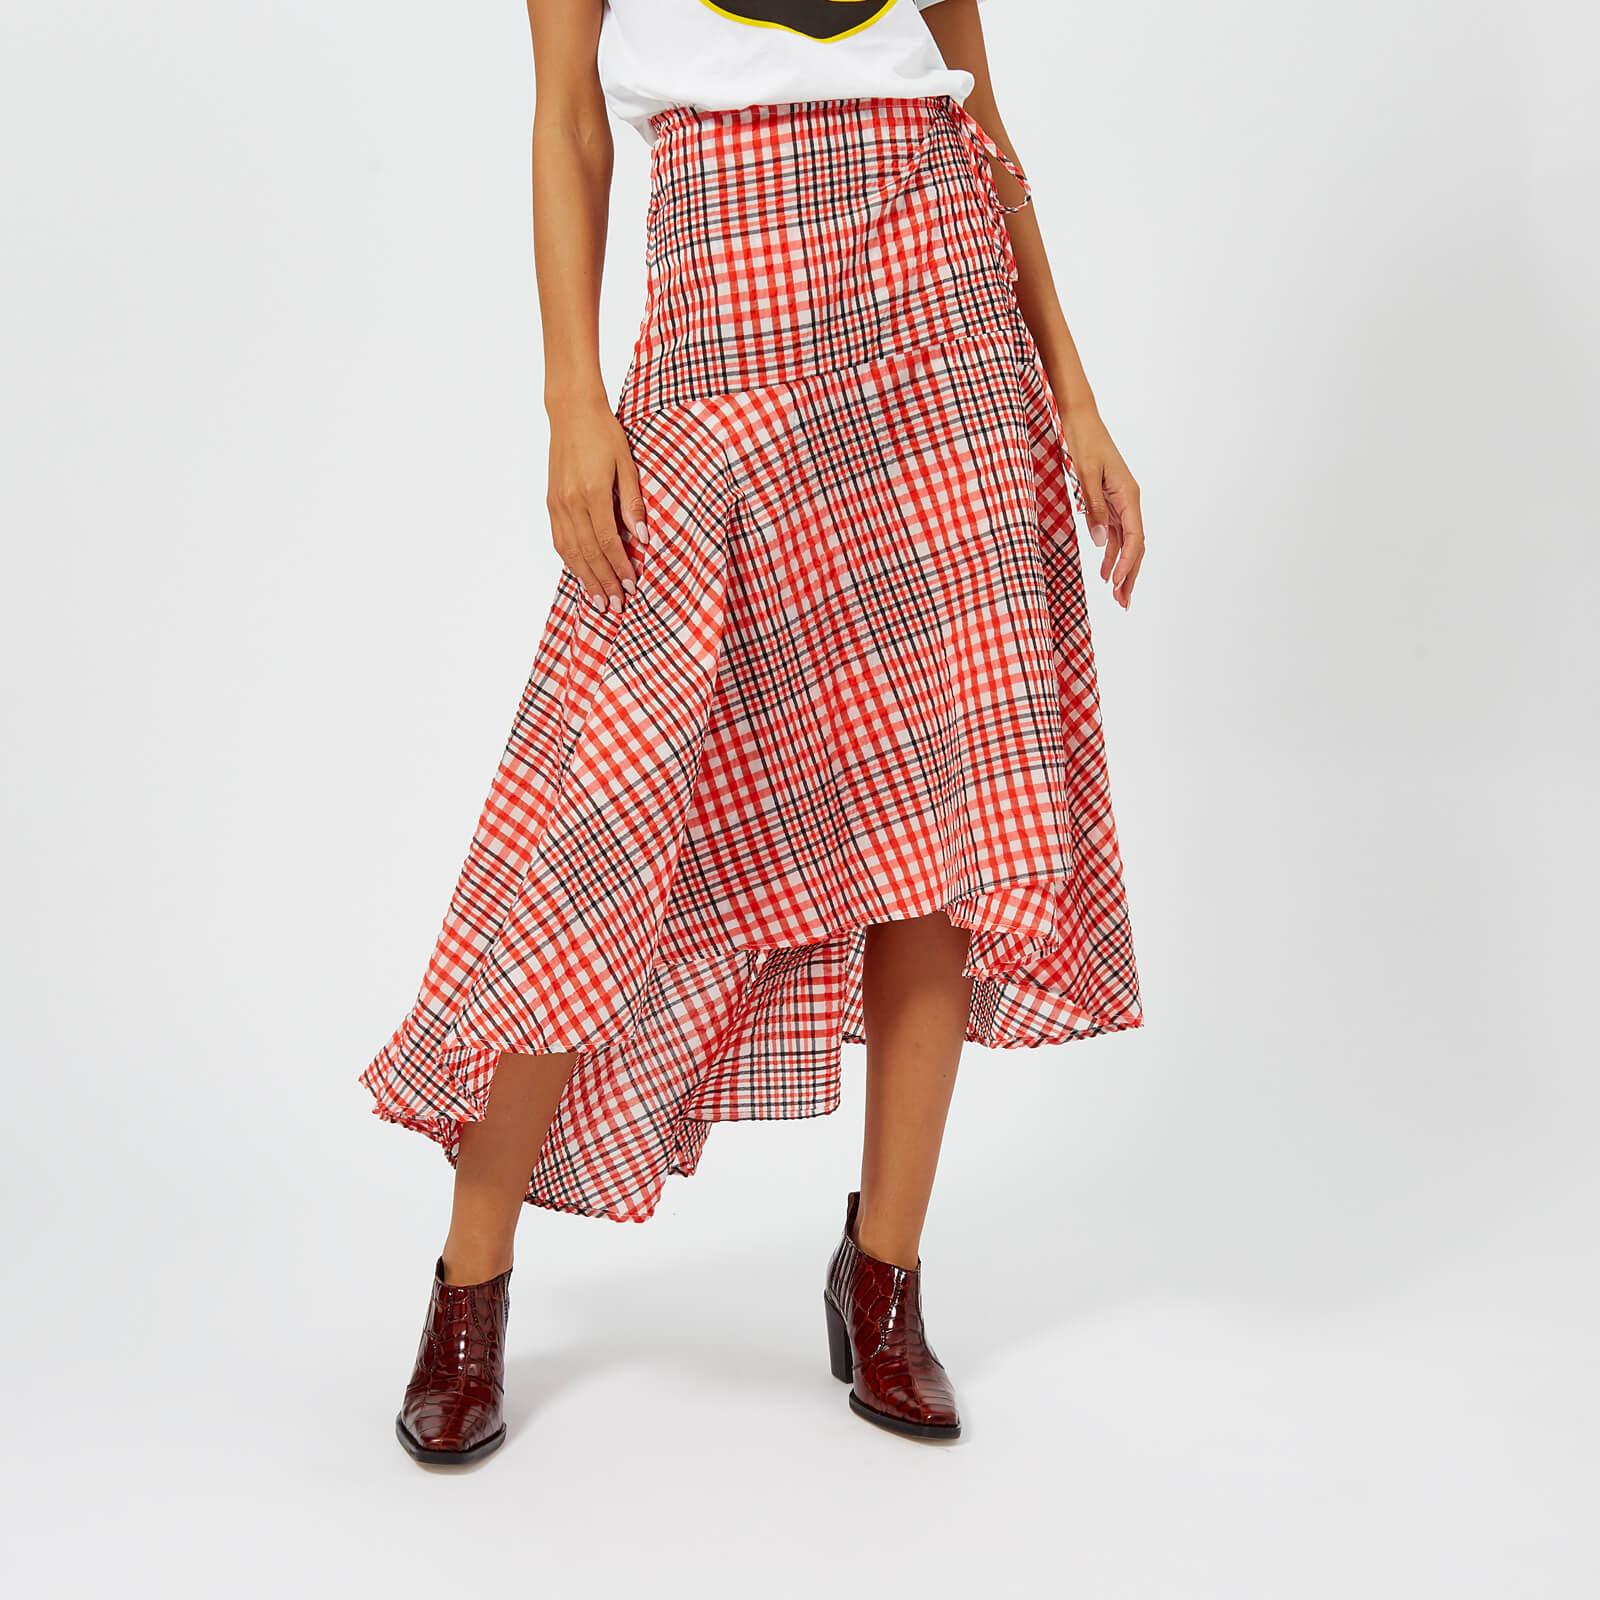 ae4efaf248 Ganni Women's Charron Skirt - Big Apple Red - Free UK Delivery over £50